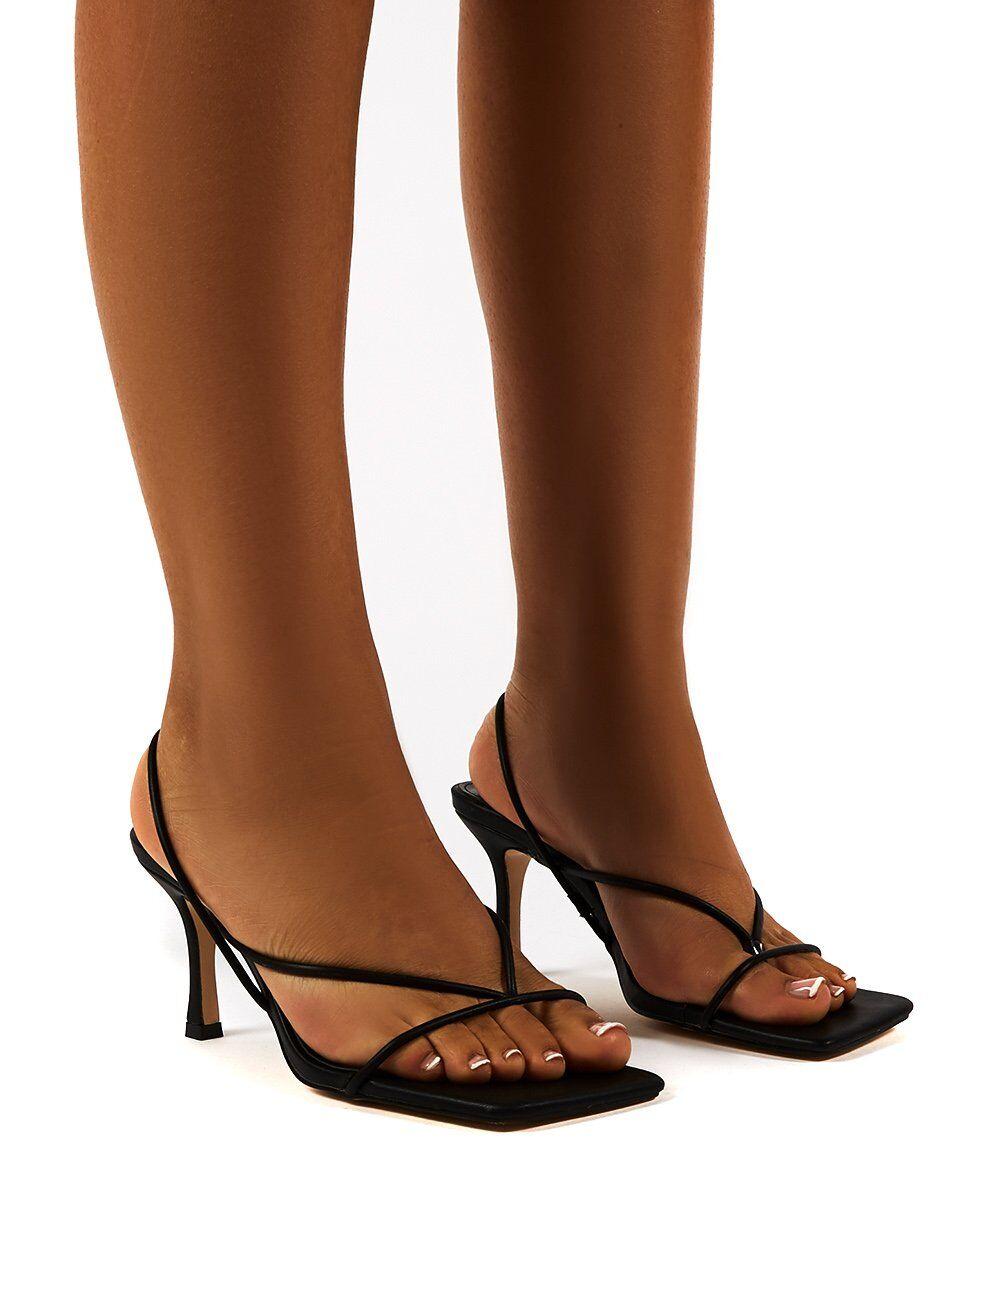 Public Desire USA Annika Black Wide Fit Strappy Heels - US 8